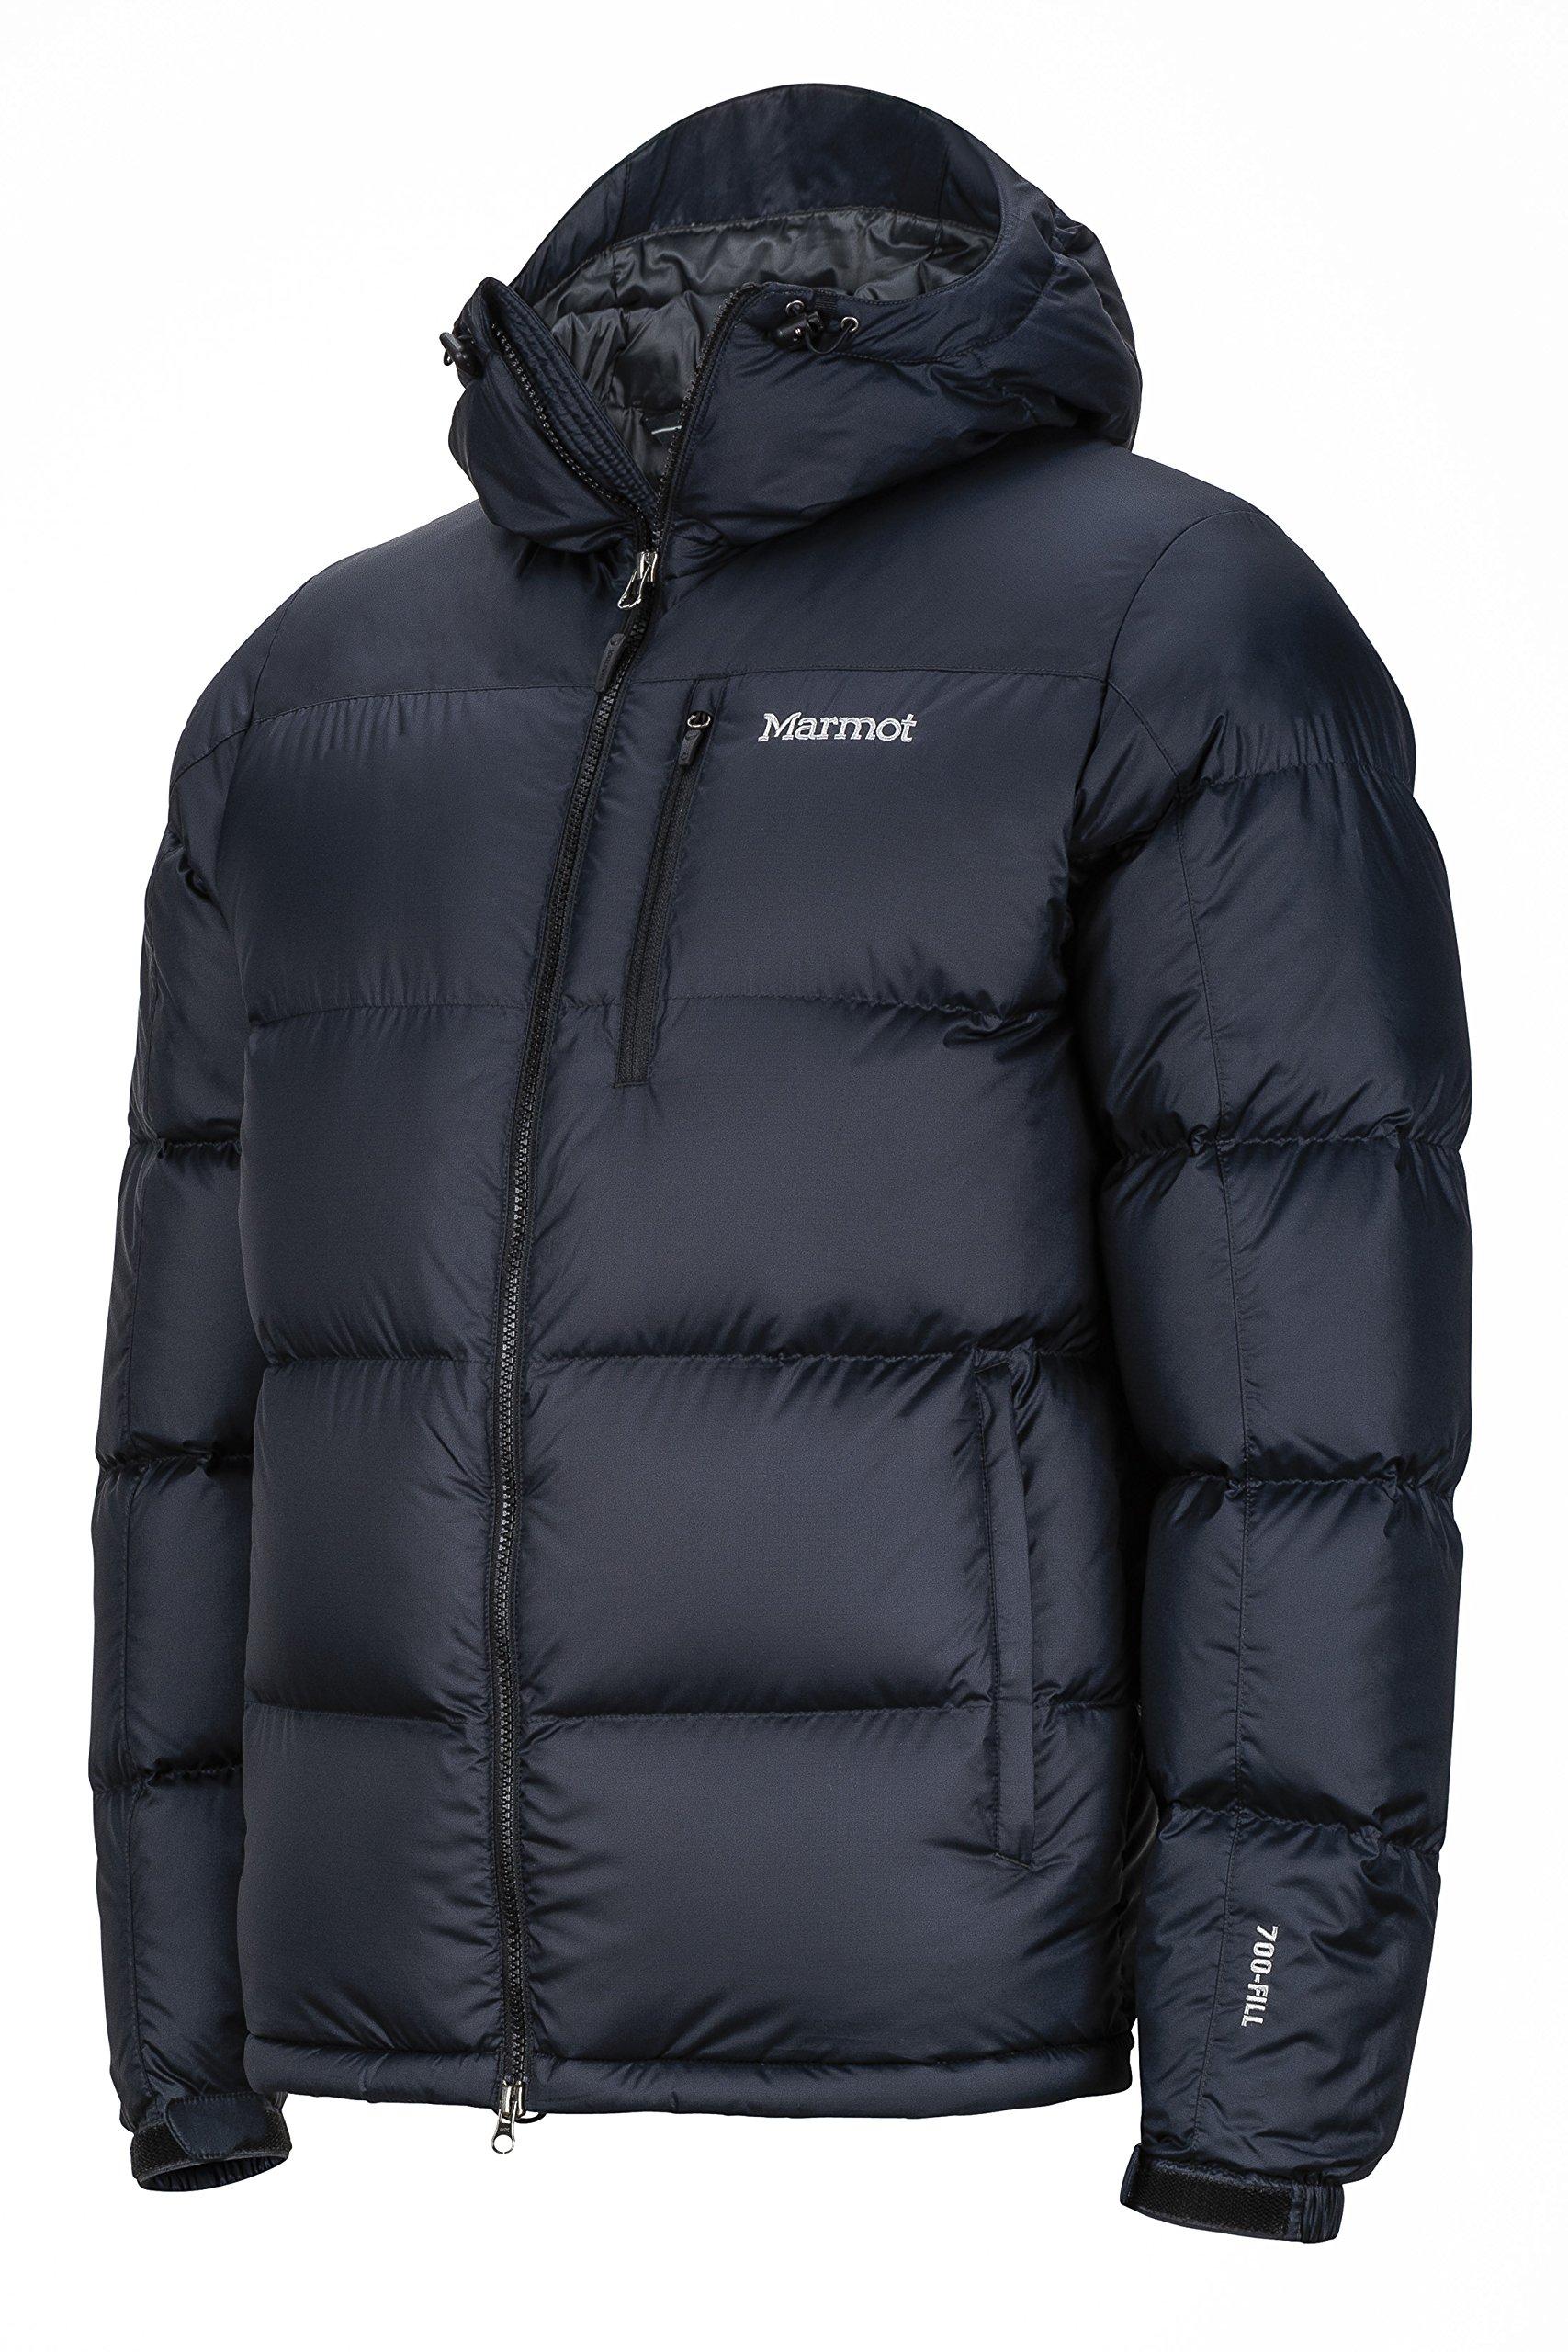 91kI2hZZyeL - Marmot Guides Down Winter Puffer Jacket with Hood, Men, 700 Fill Power Down